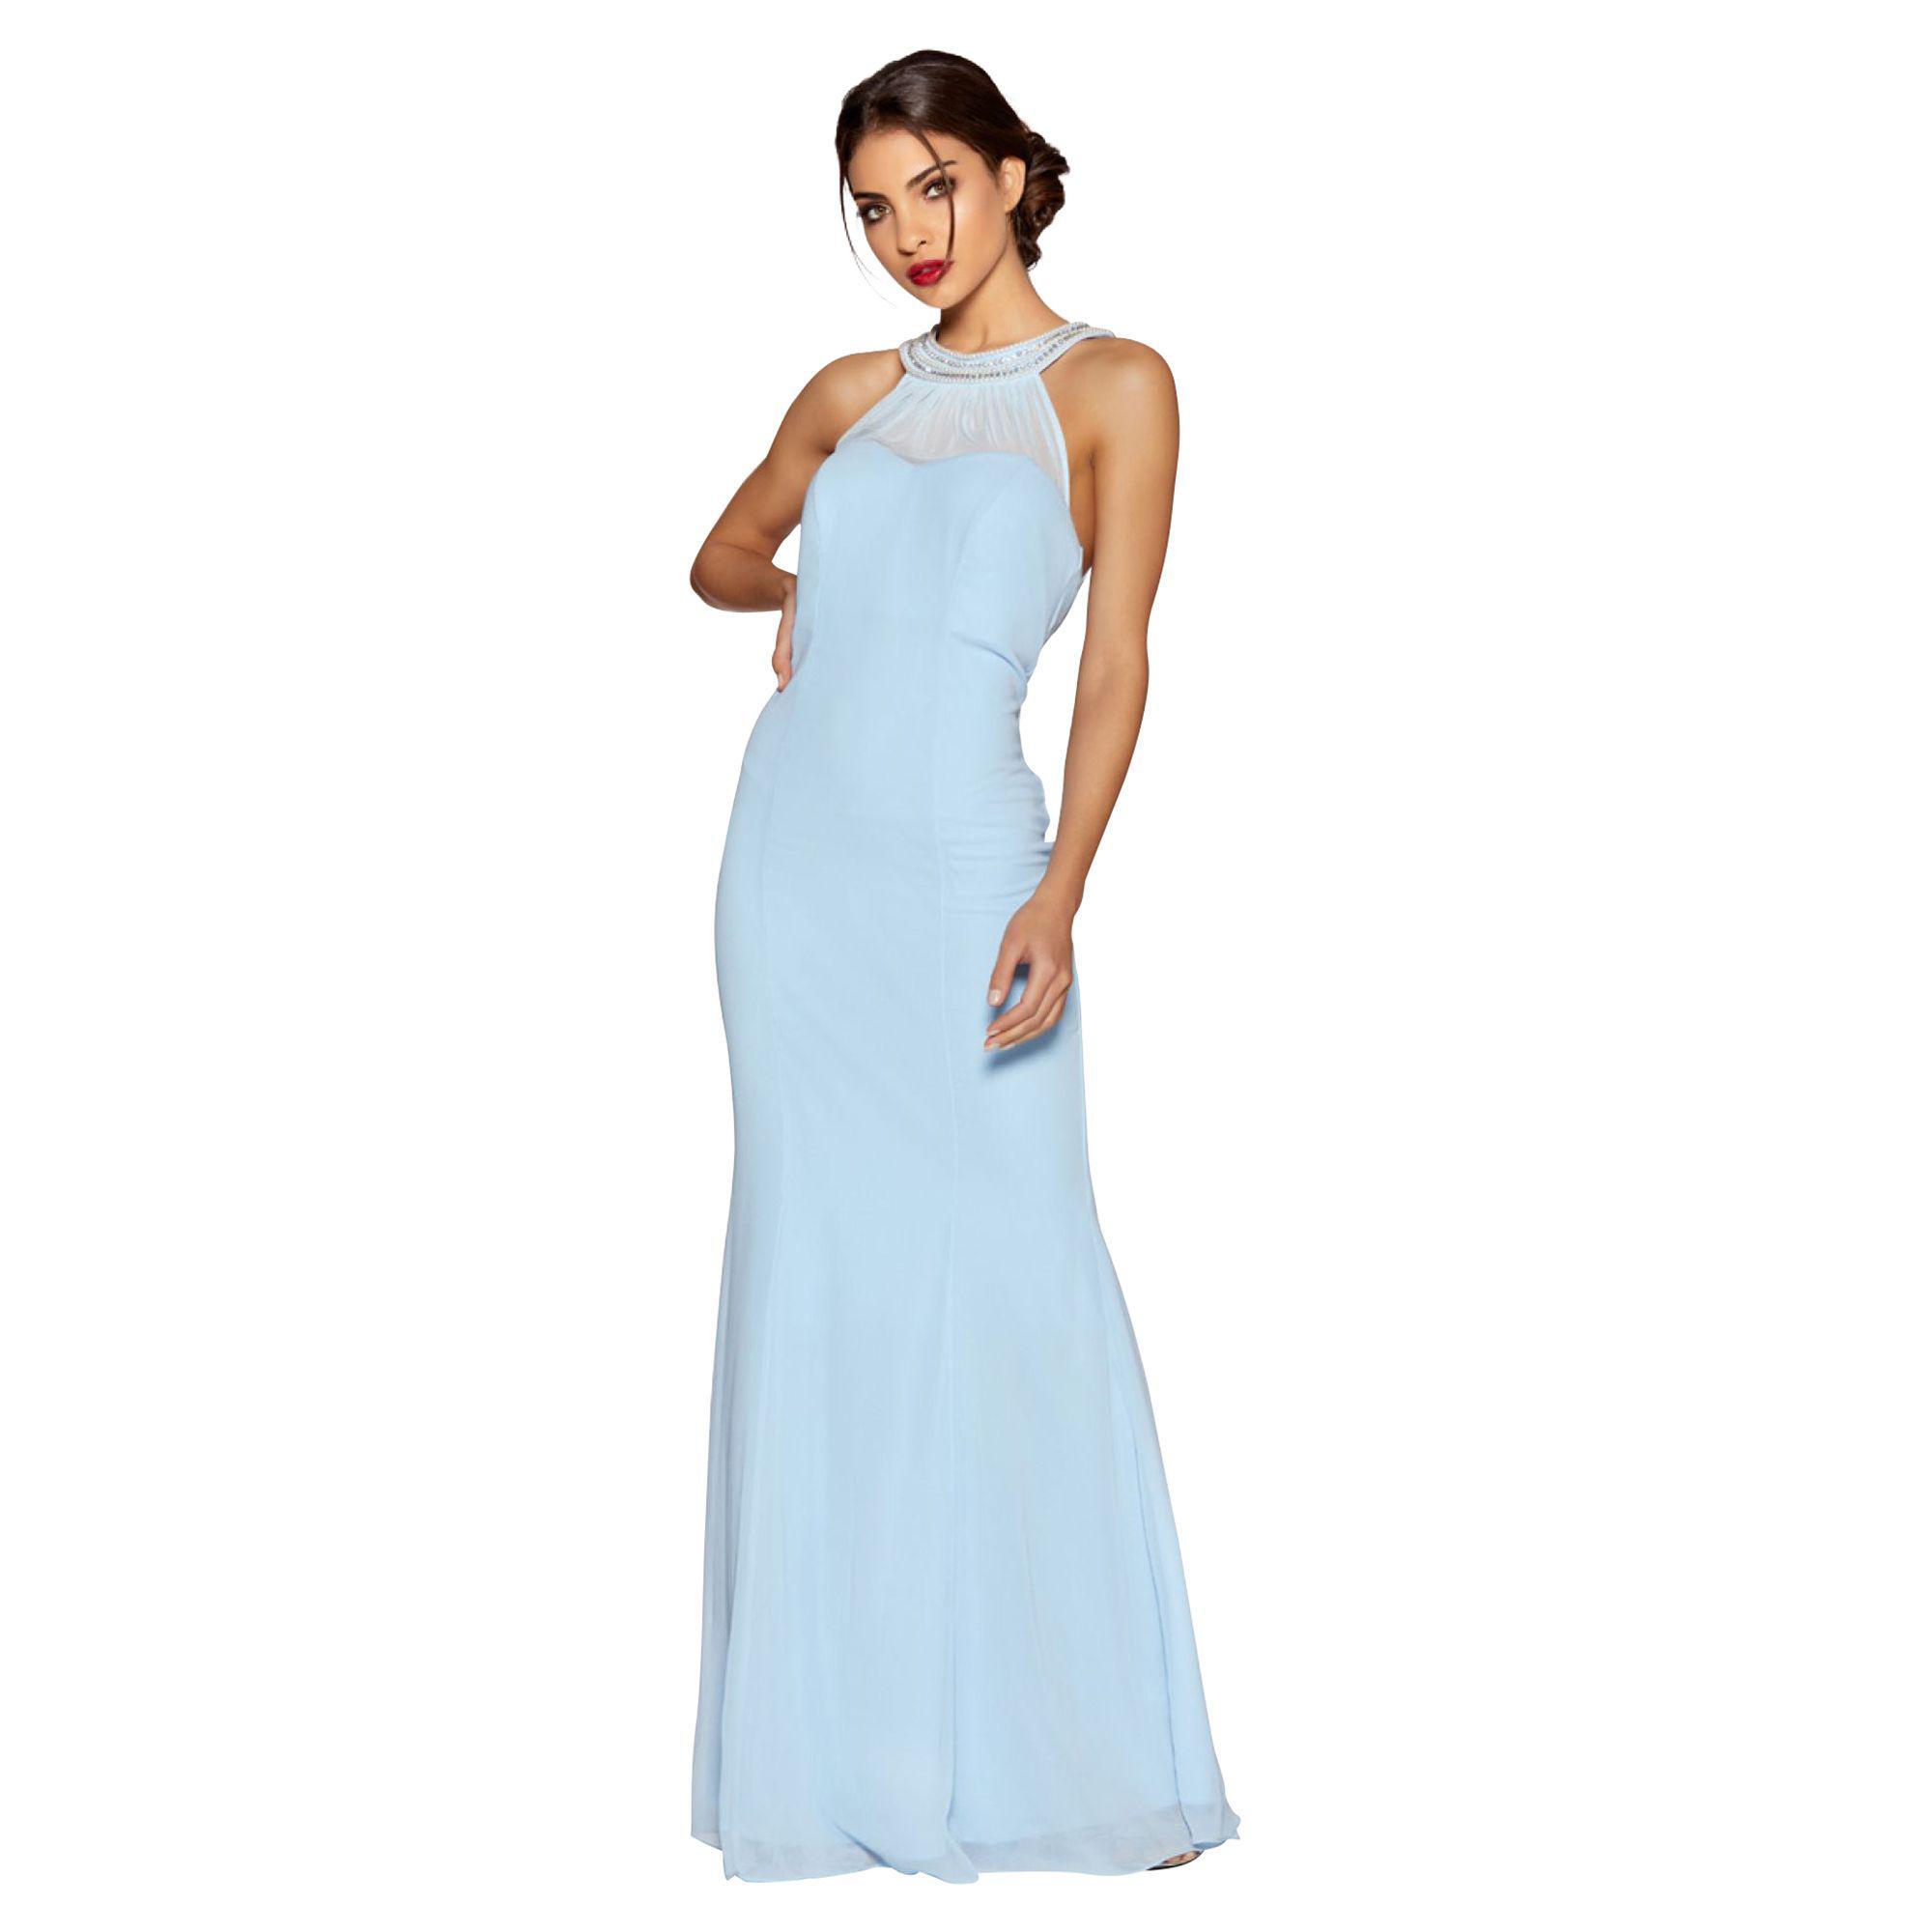 39400620c Quiz - Powder Blue Chiffon Sweetheart Neck Maxi Dress - Lyst. View  fullscreen